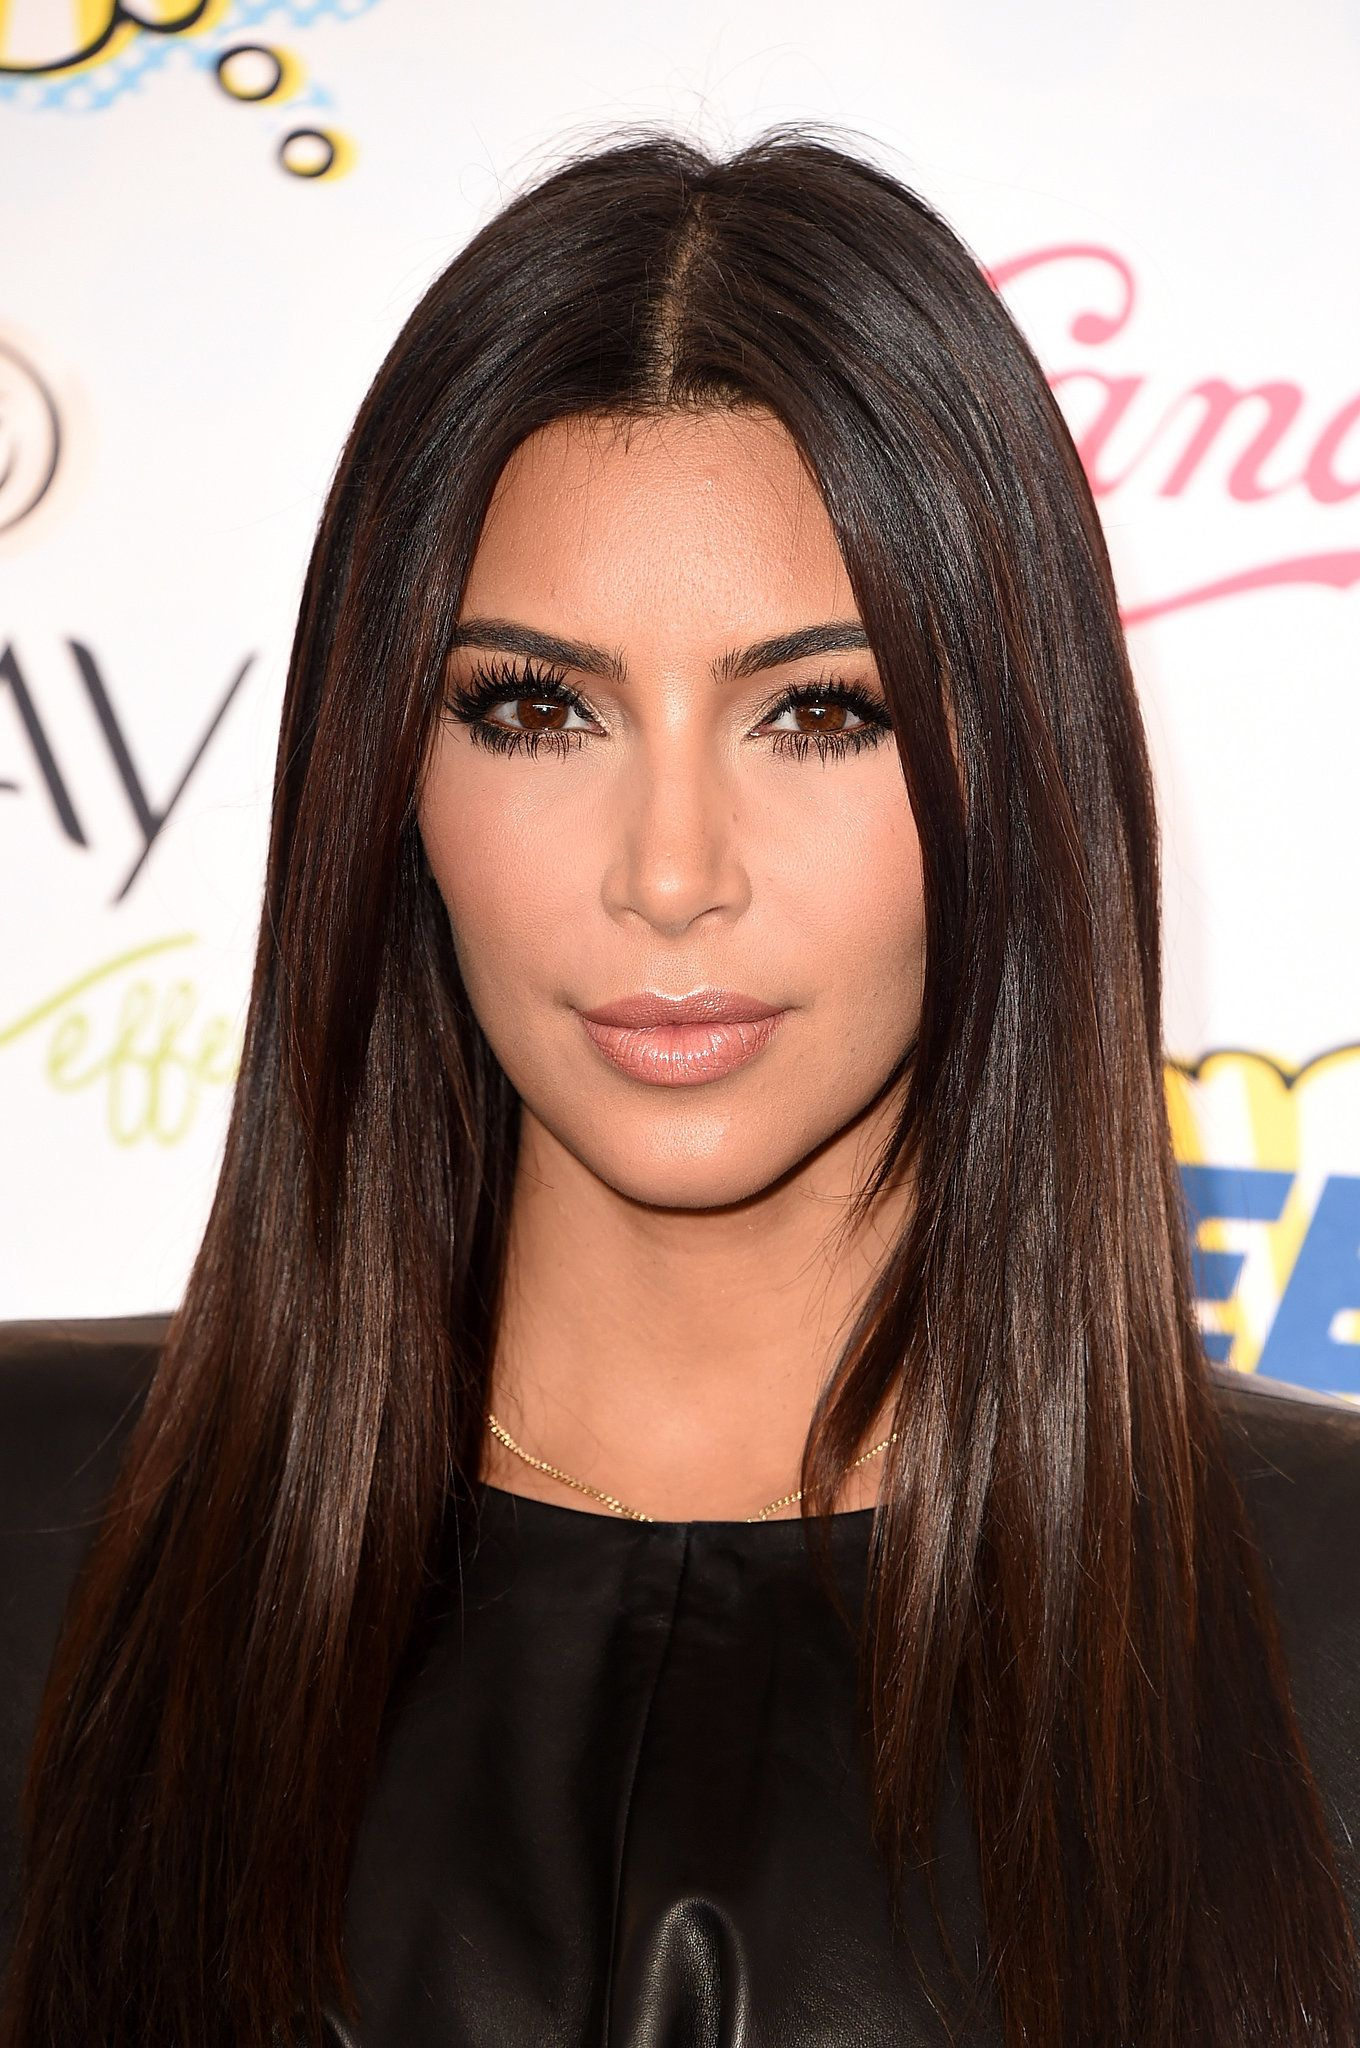 Kim Kardashian bts. 2018-2019 celebrityes photos leaks!